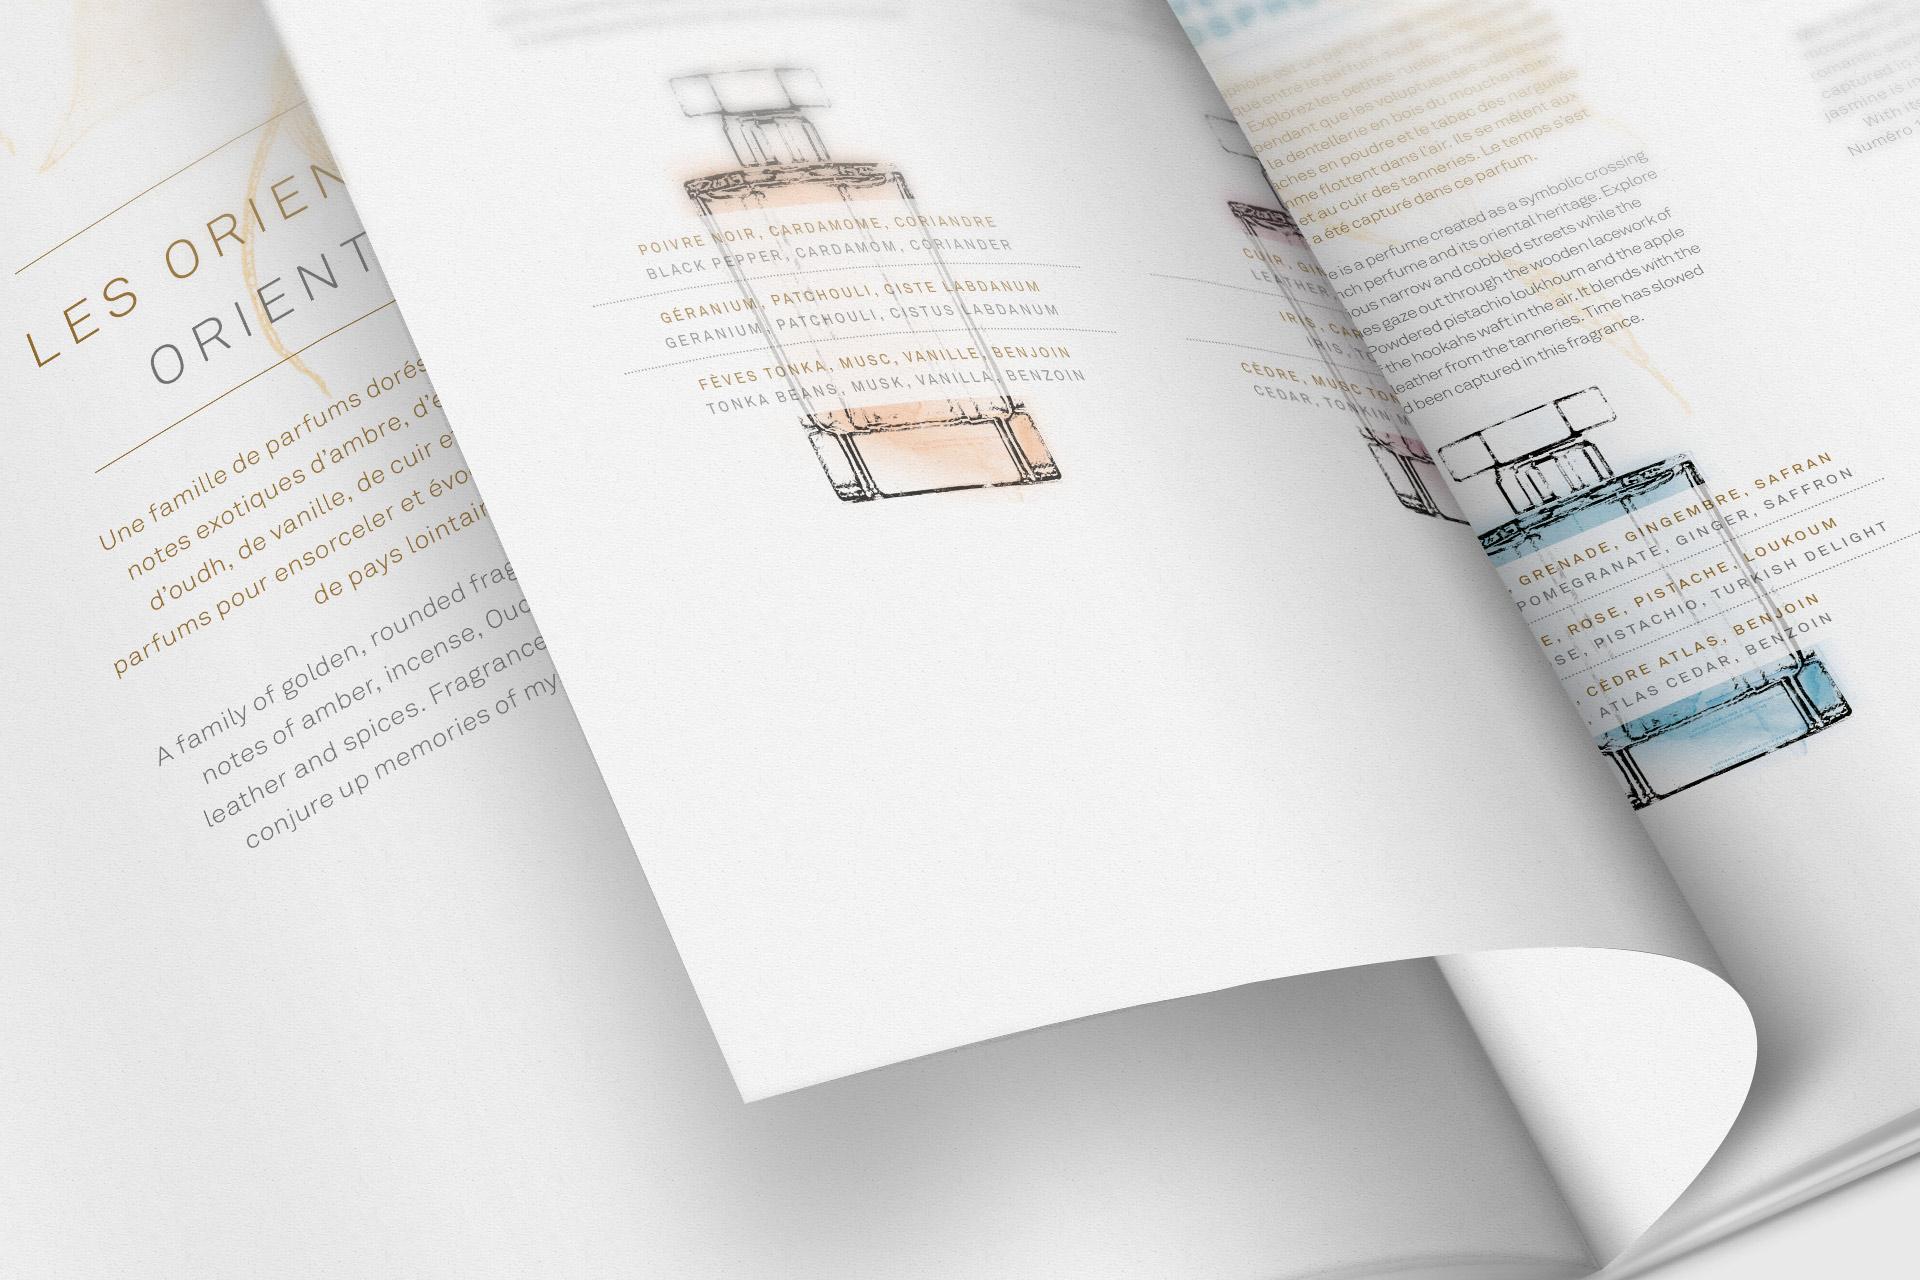 lartisan-parfumeur-visual-identity-design-pressbook-02.jpg